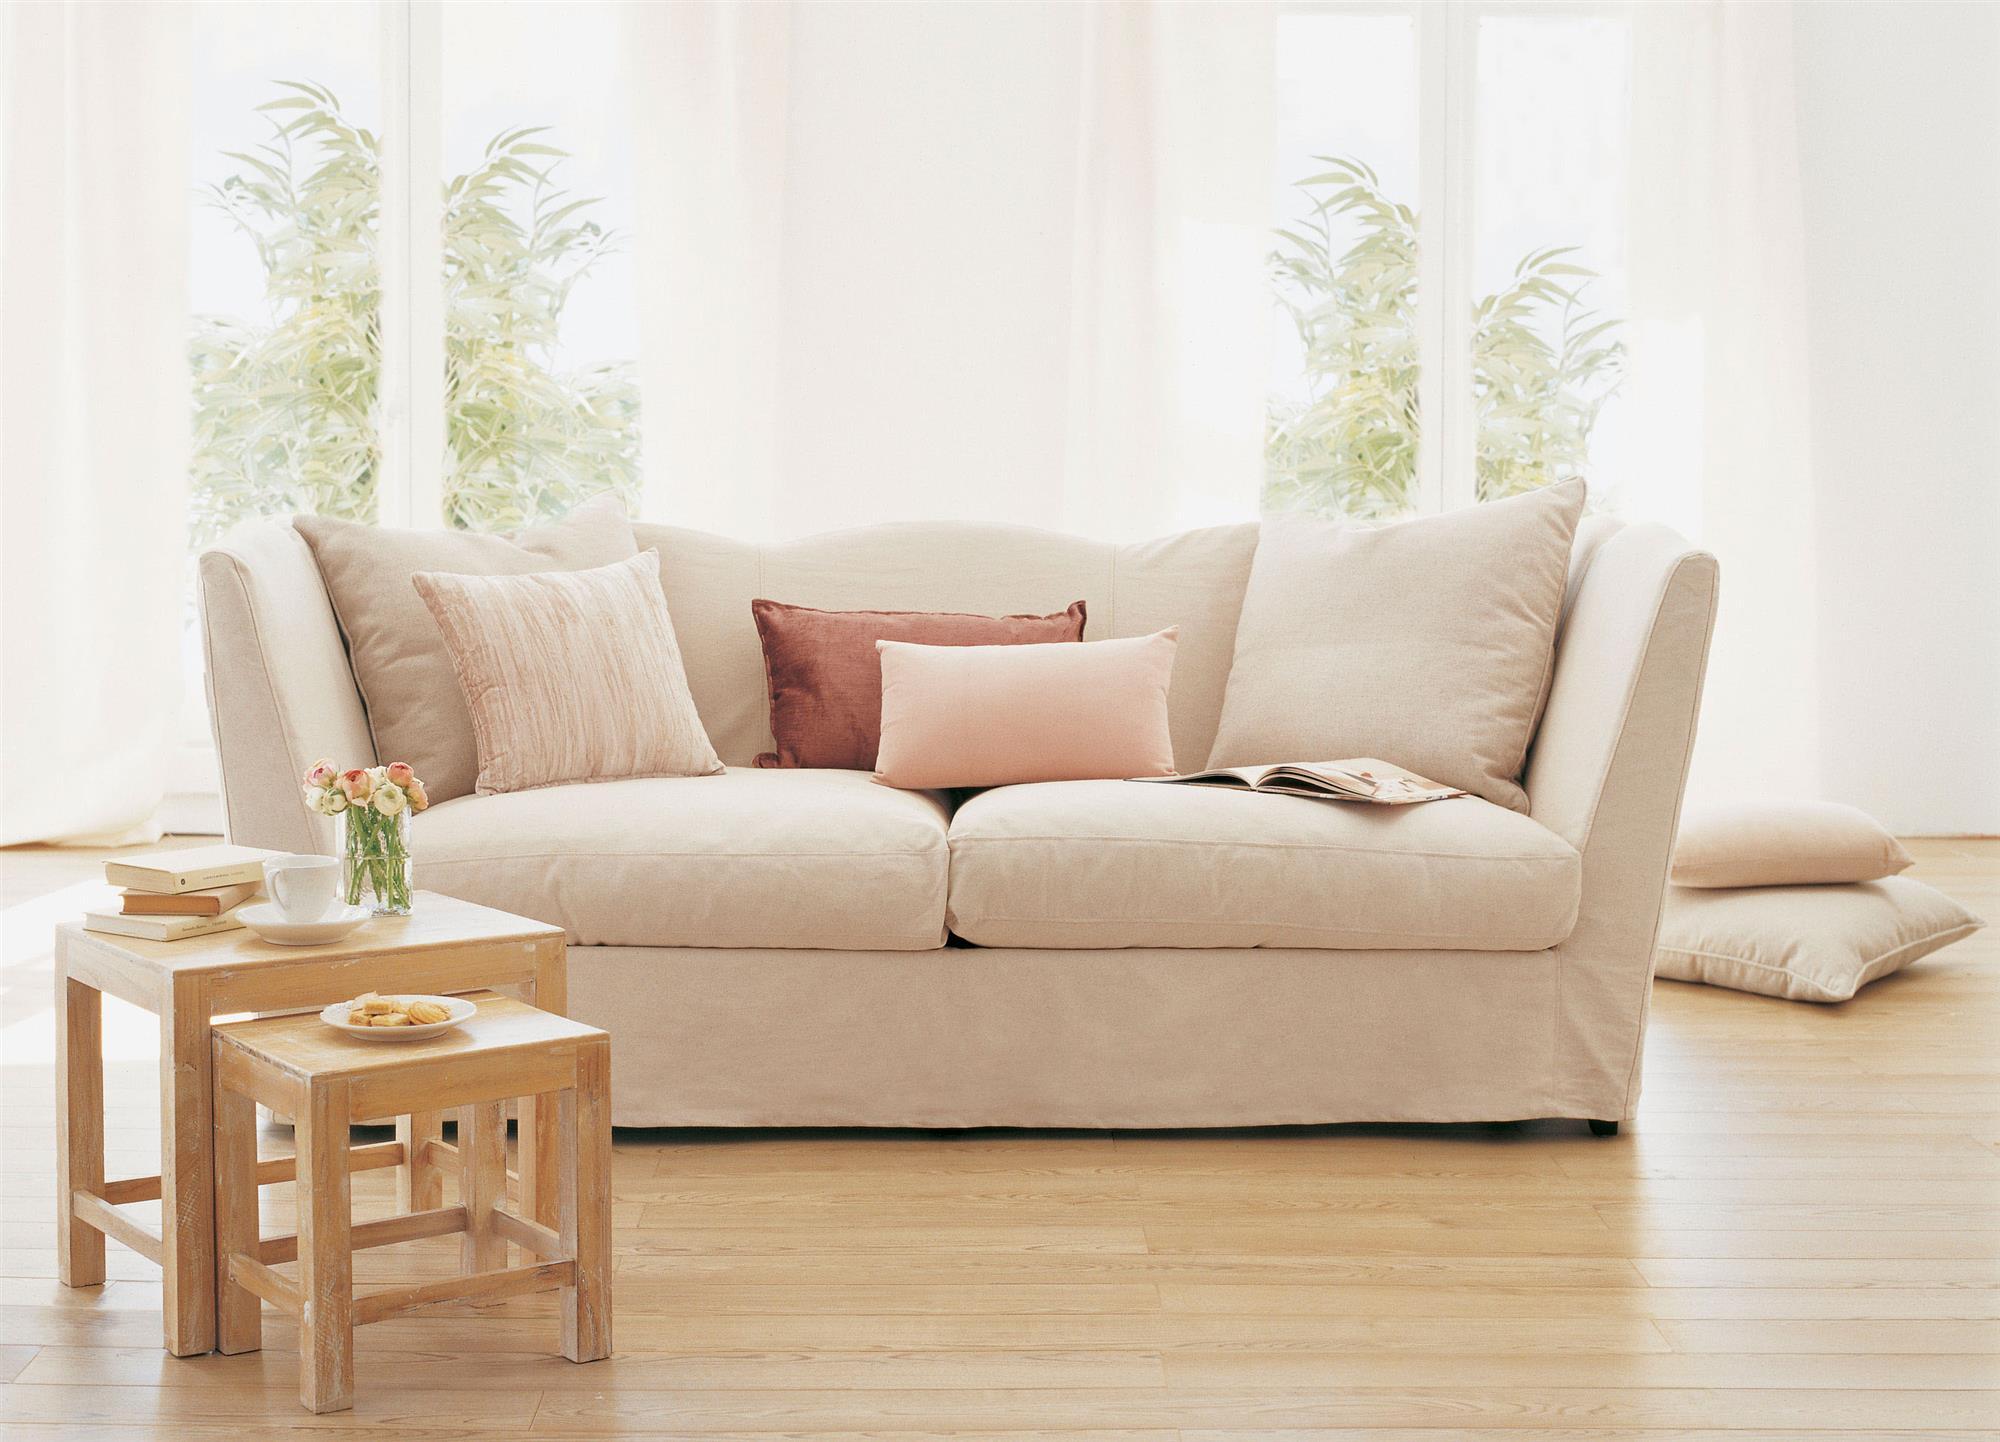 Fundas de sof las mejores soluciones ajustables para - Fundas elasticas para sofa ...